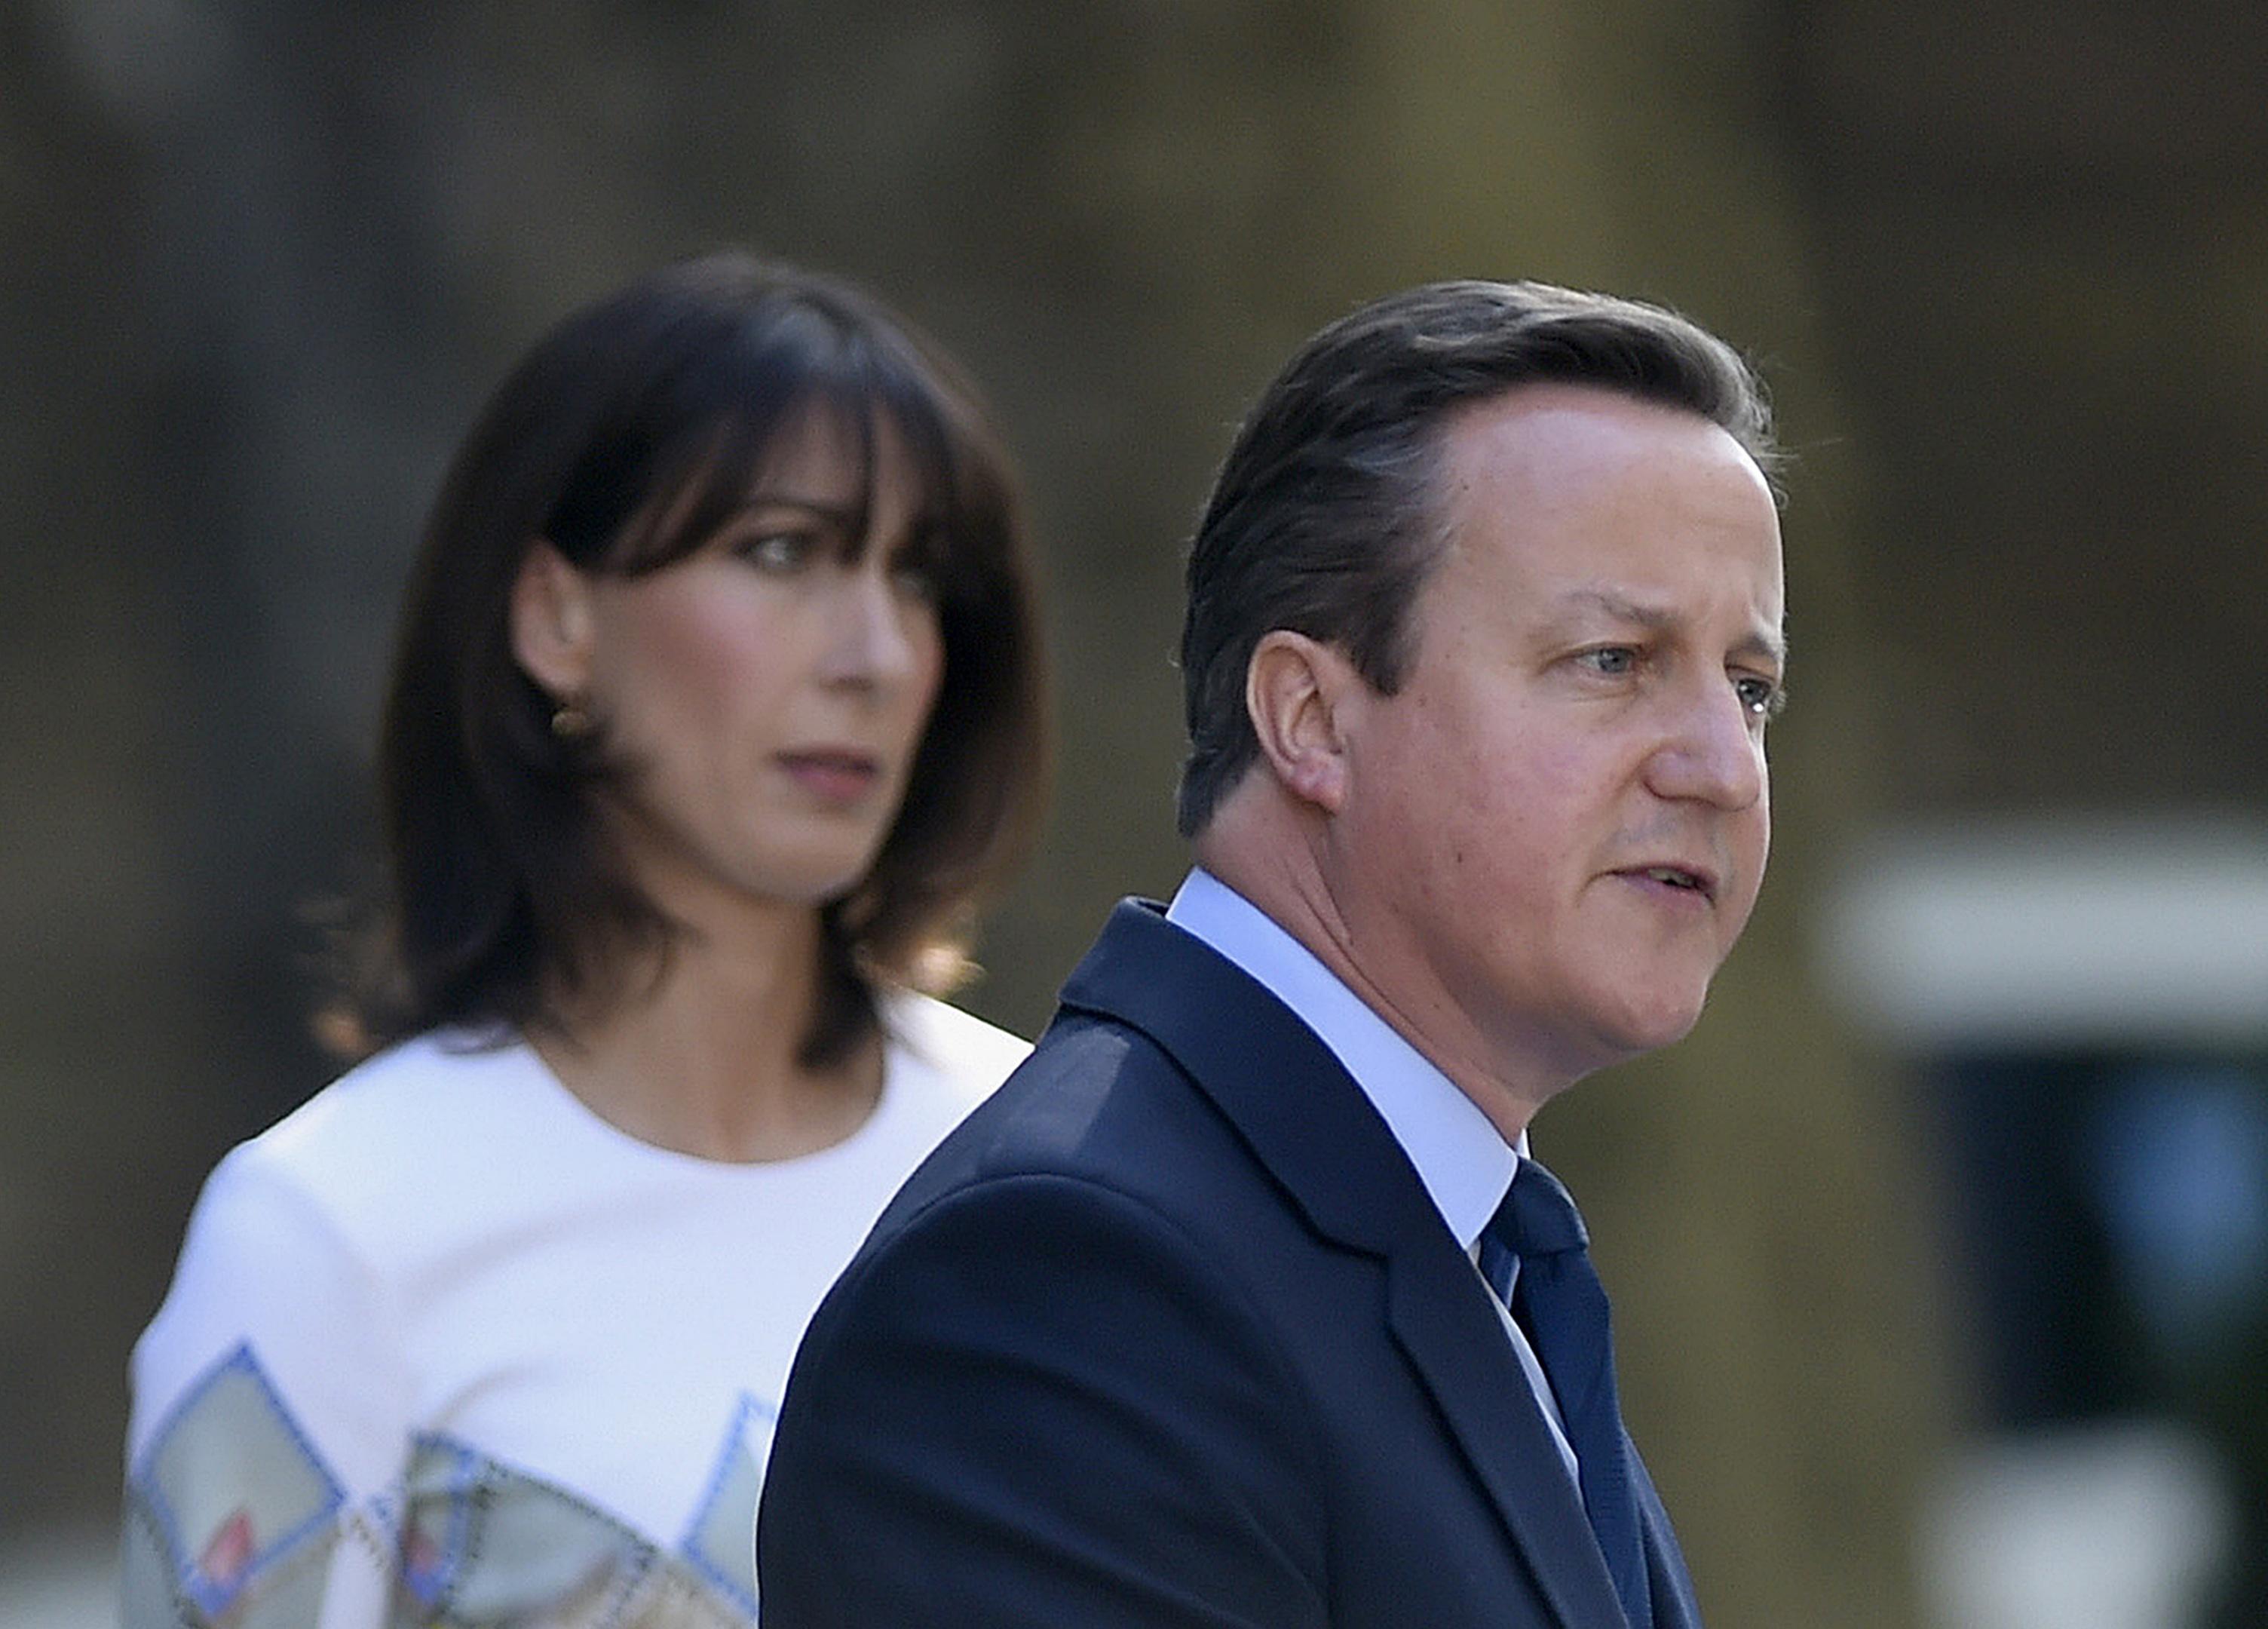 David Cameron announces his resignation at 10 Downing Street.